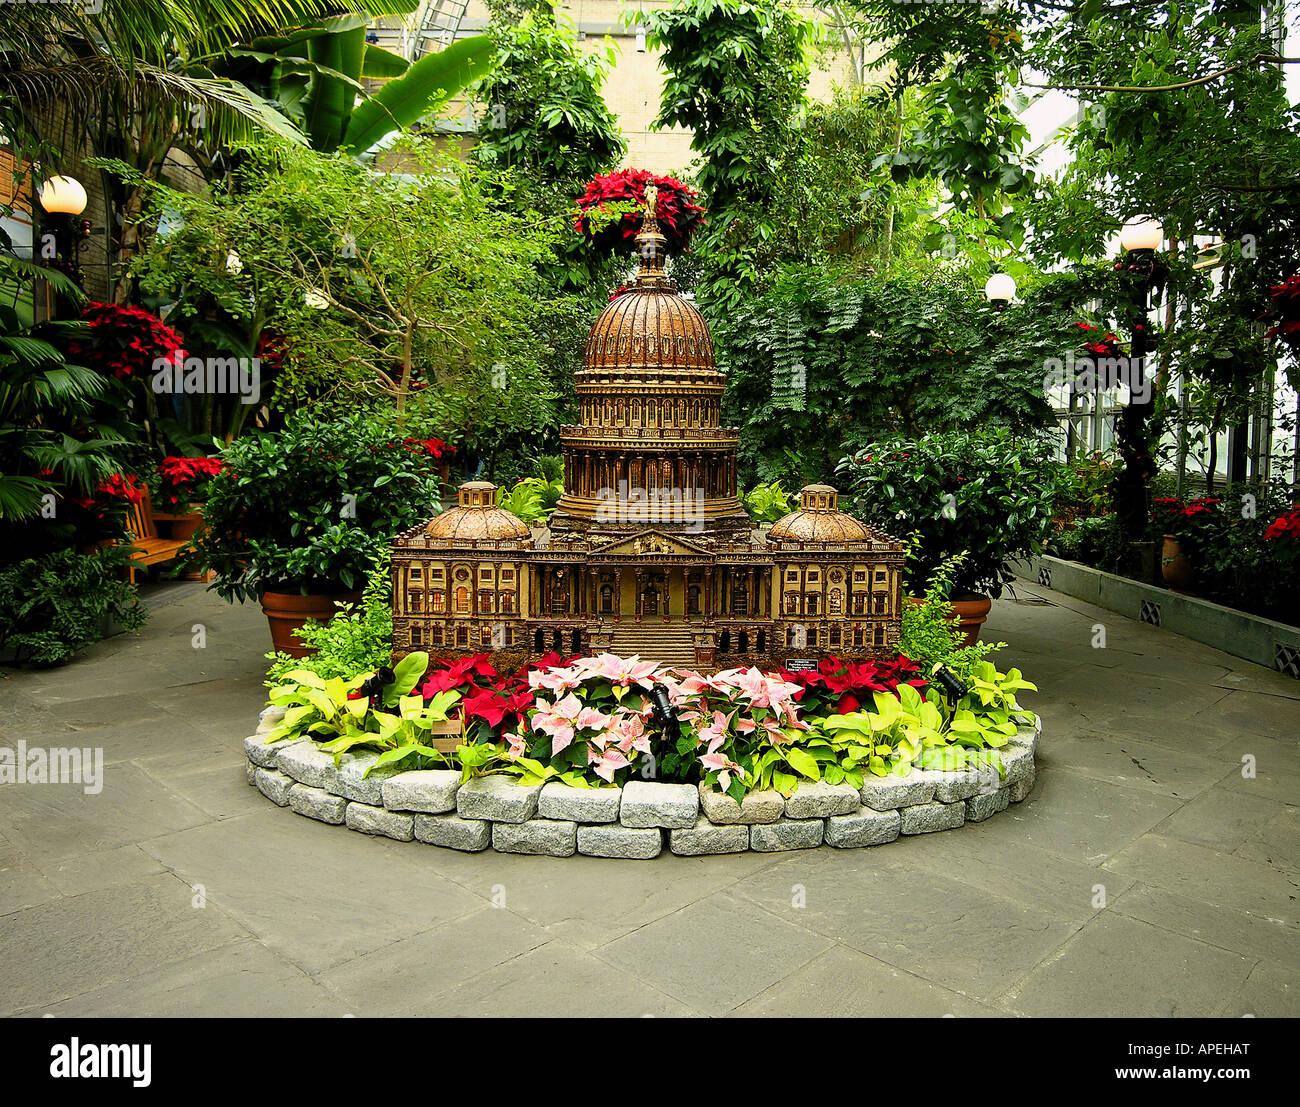 Beautiful National Botanical Gardens Photos - Landscaping Ideas for ...